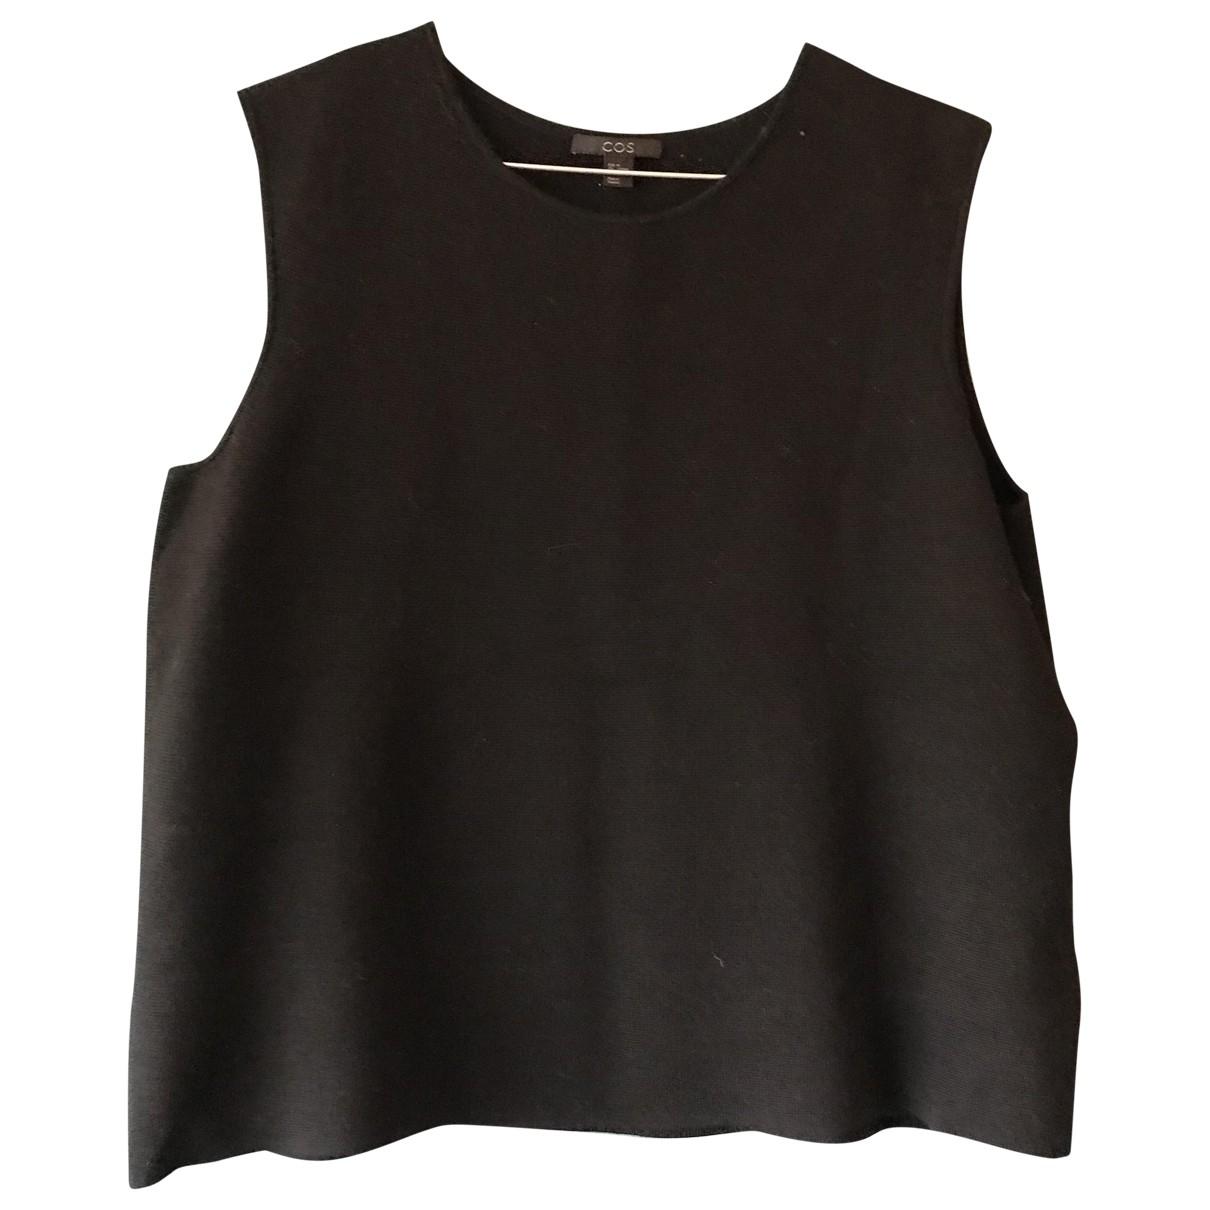 Camiseta sin mangas de Lana Cos